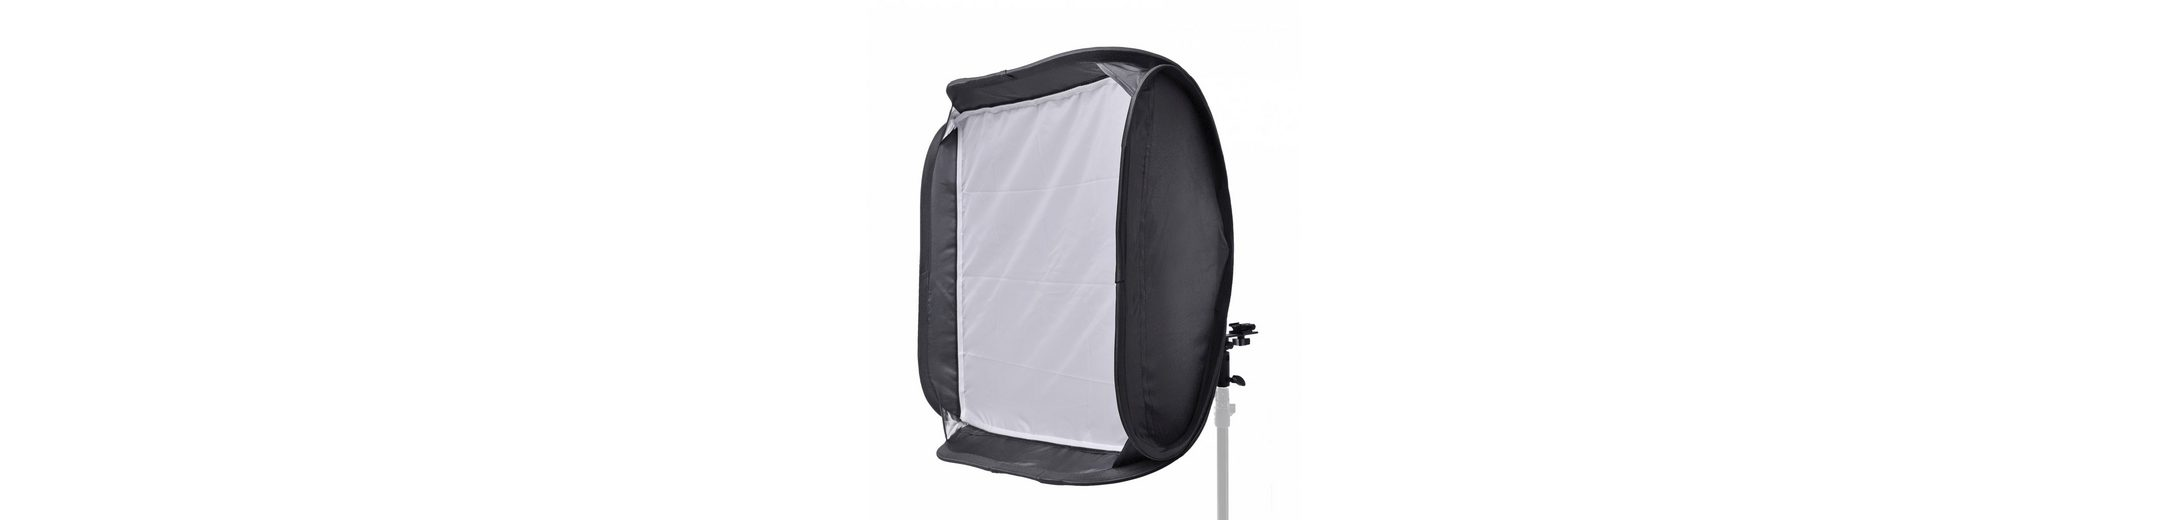 Bresser Fotostudio »BRESSER SS-20 Quick-Fit Softbox 80x80cm + Wabe«